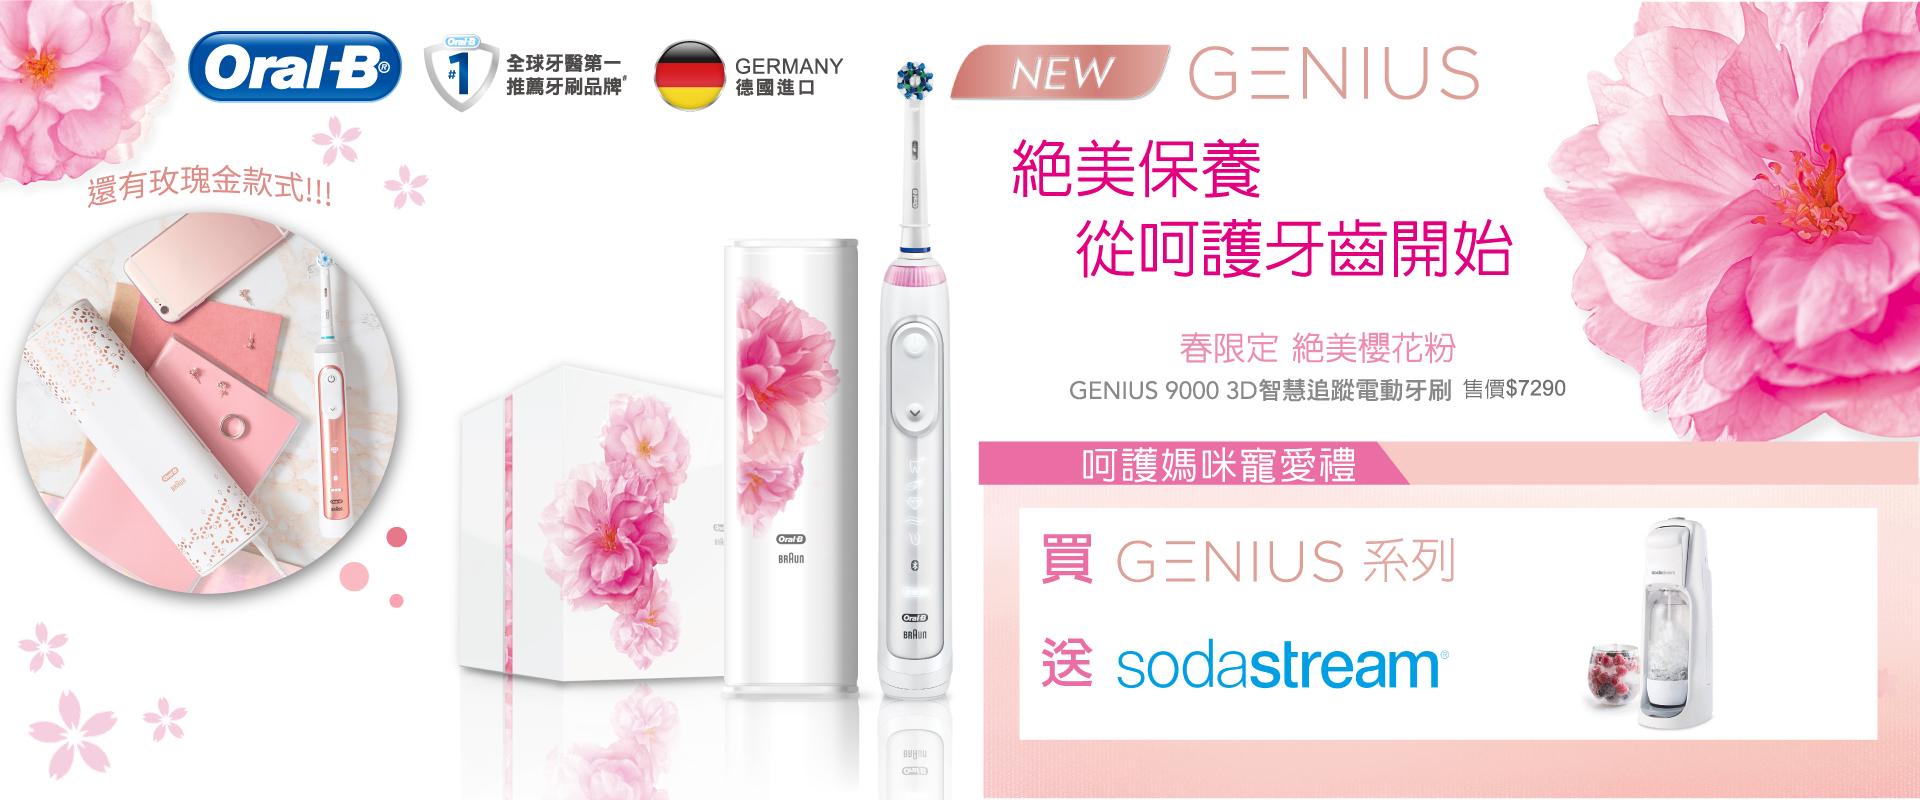 德國百靈,oral-B.歐樂B,Sodastream,JET,氣泡水機,GENIUS